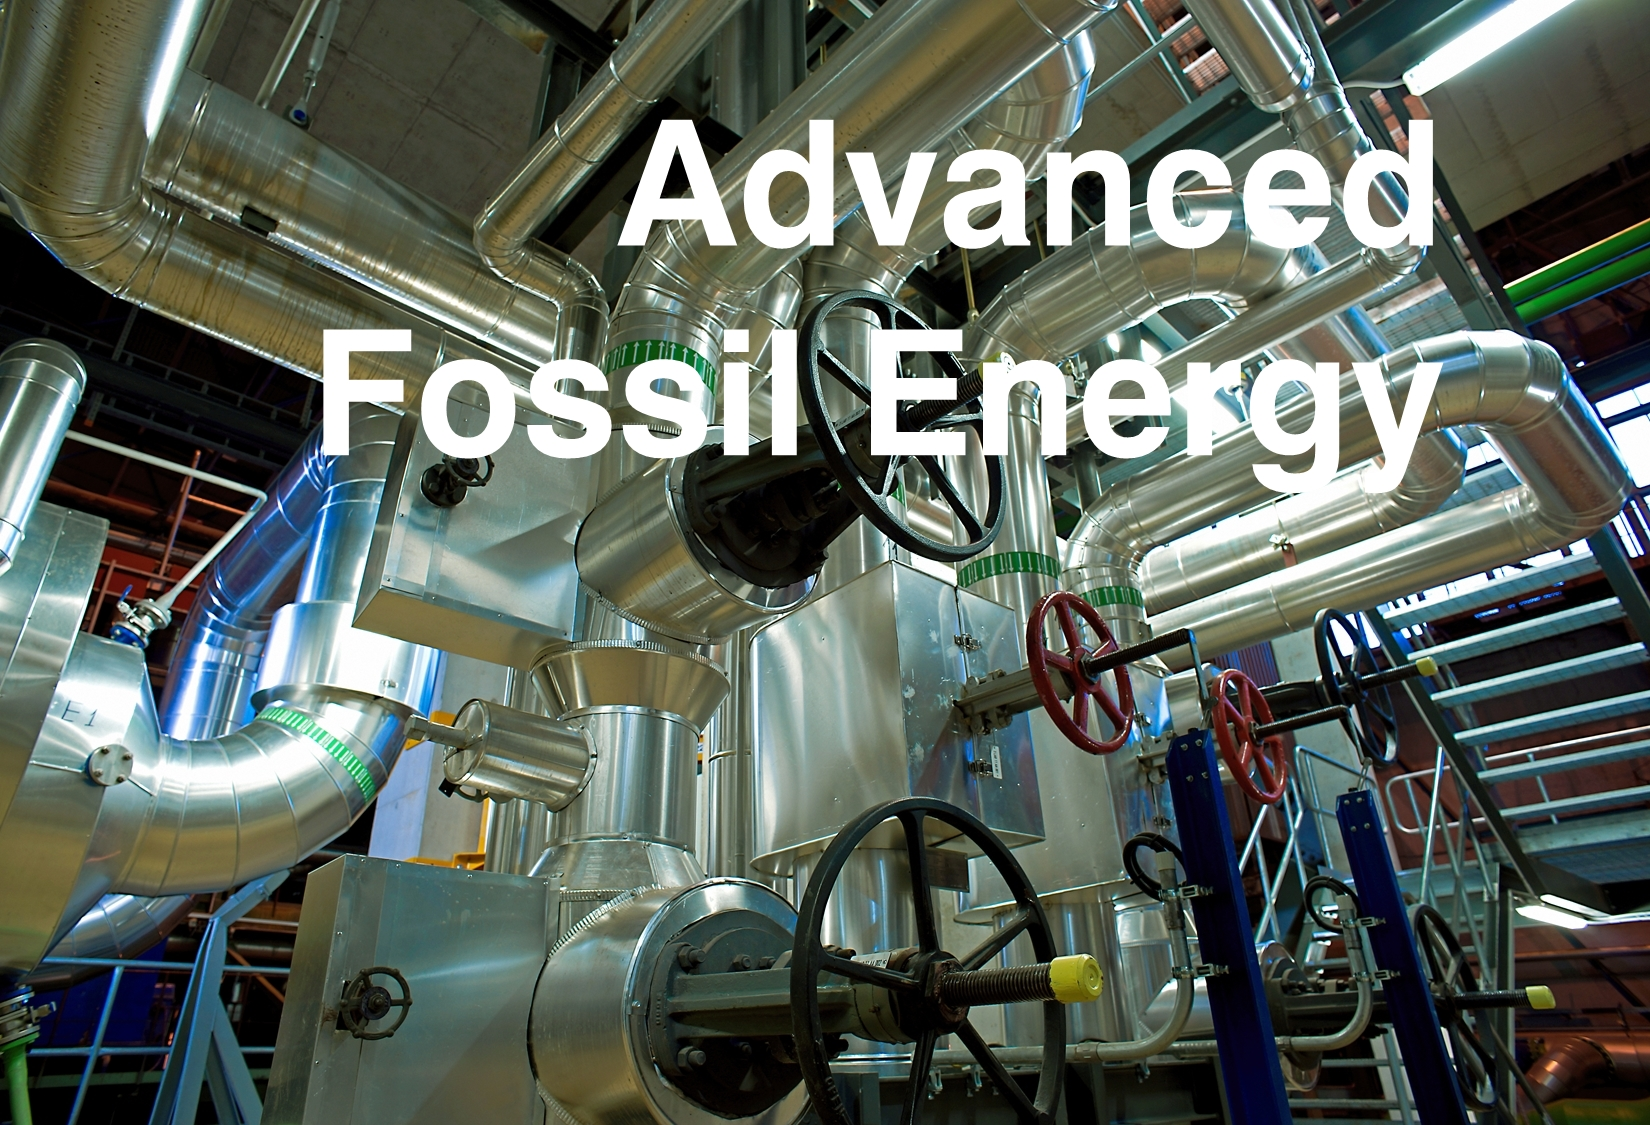 Advanced Fossil Energy